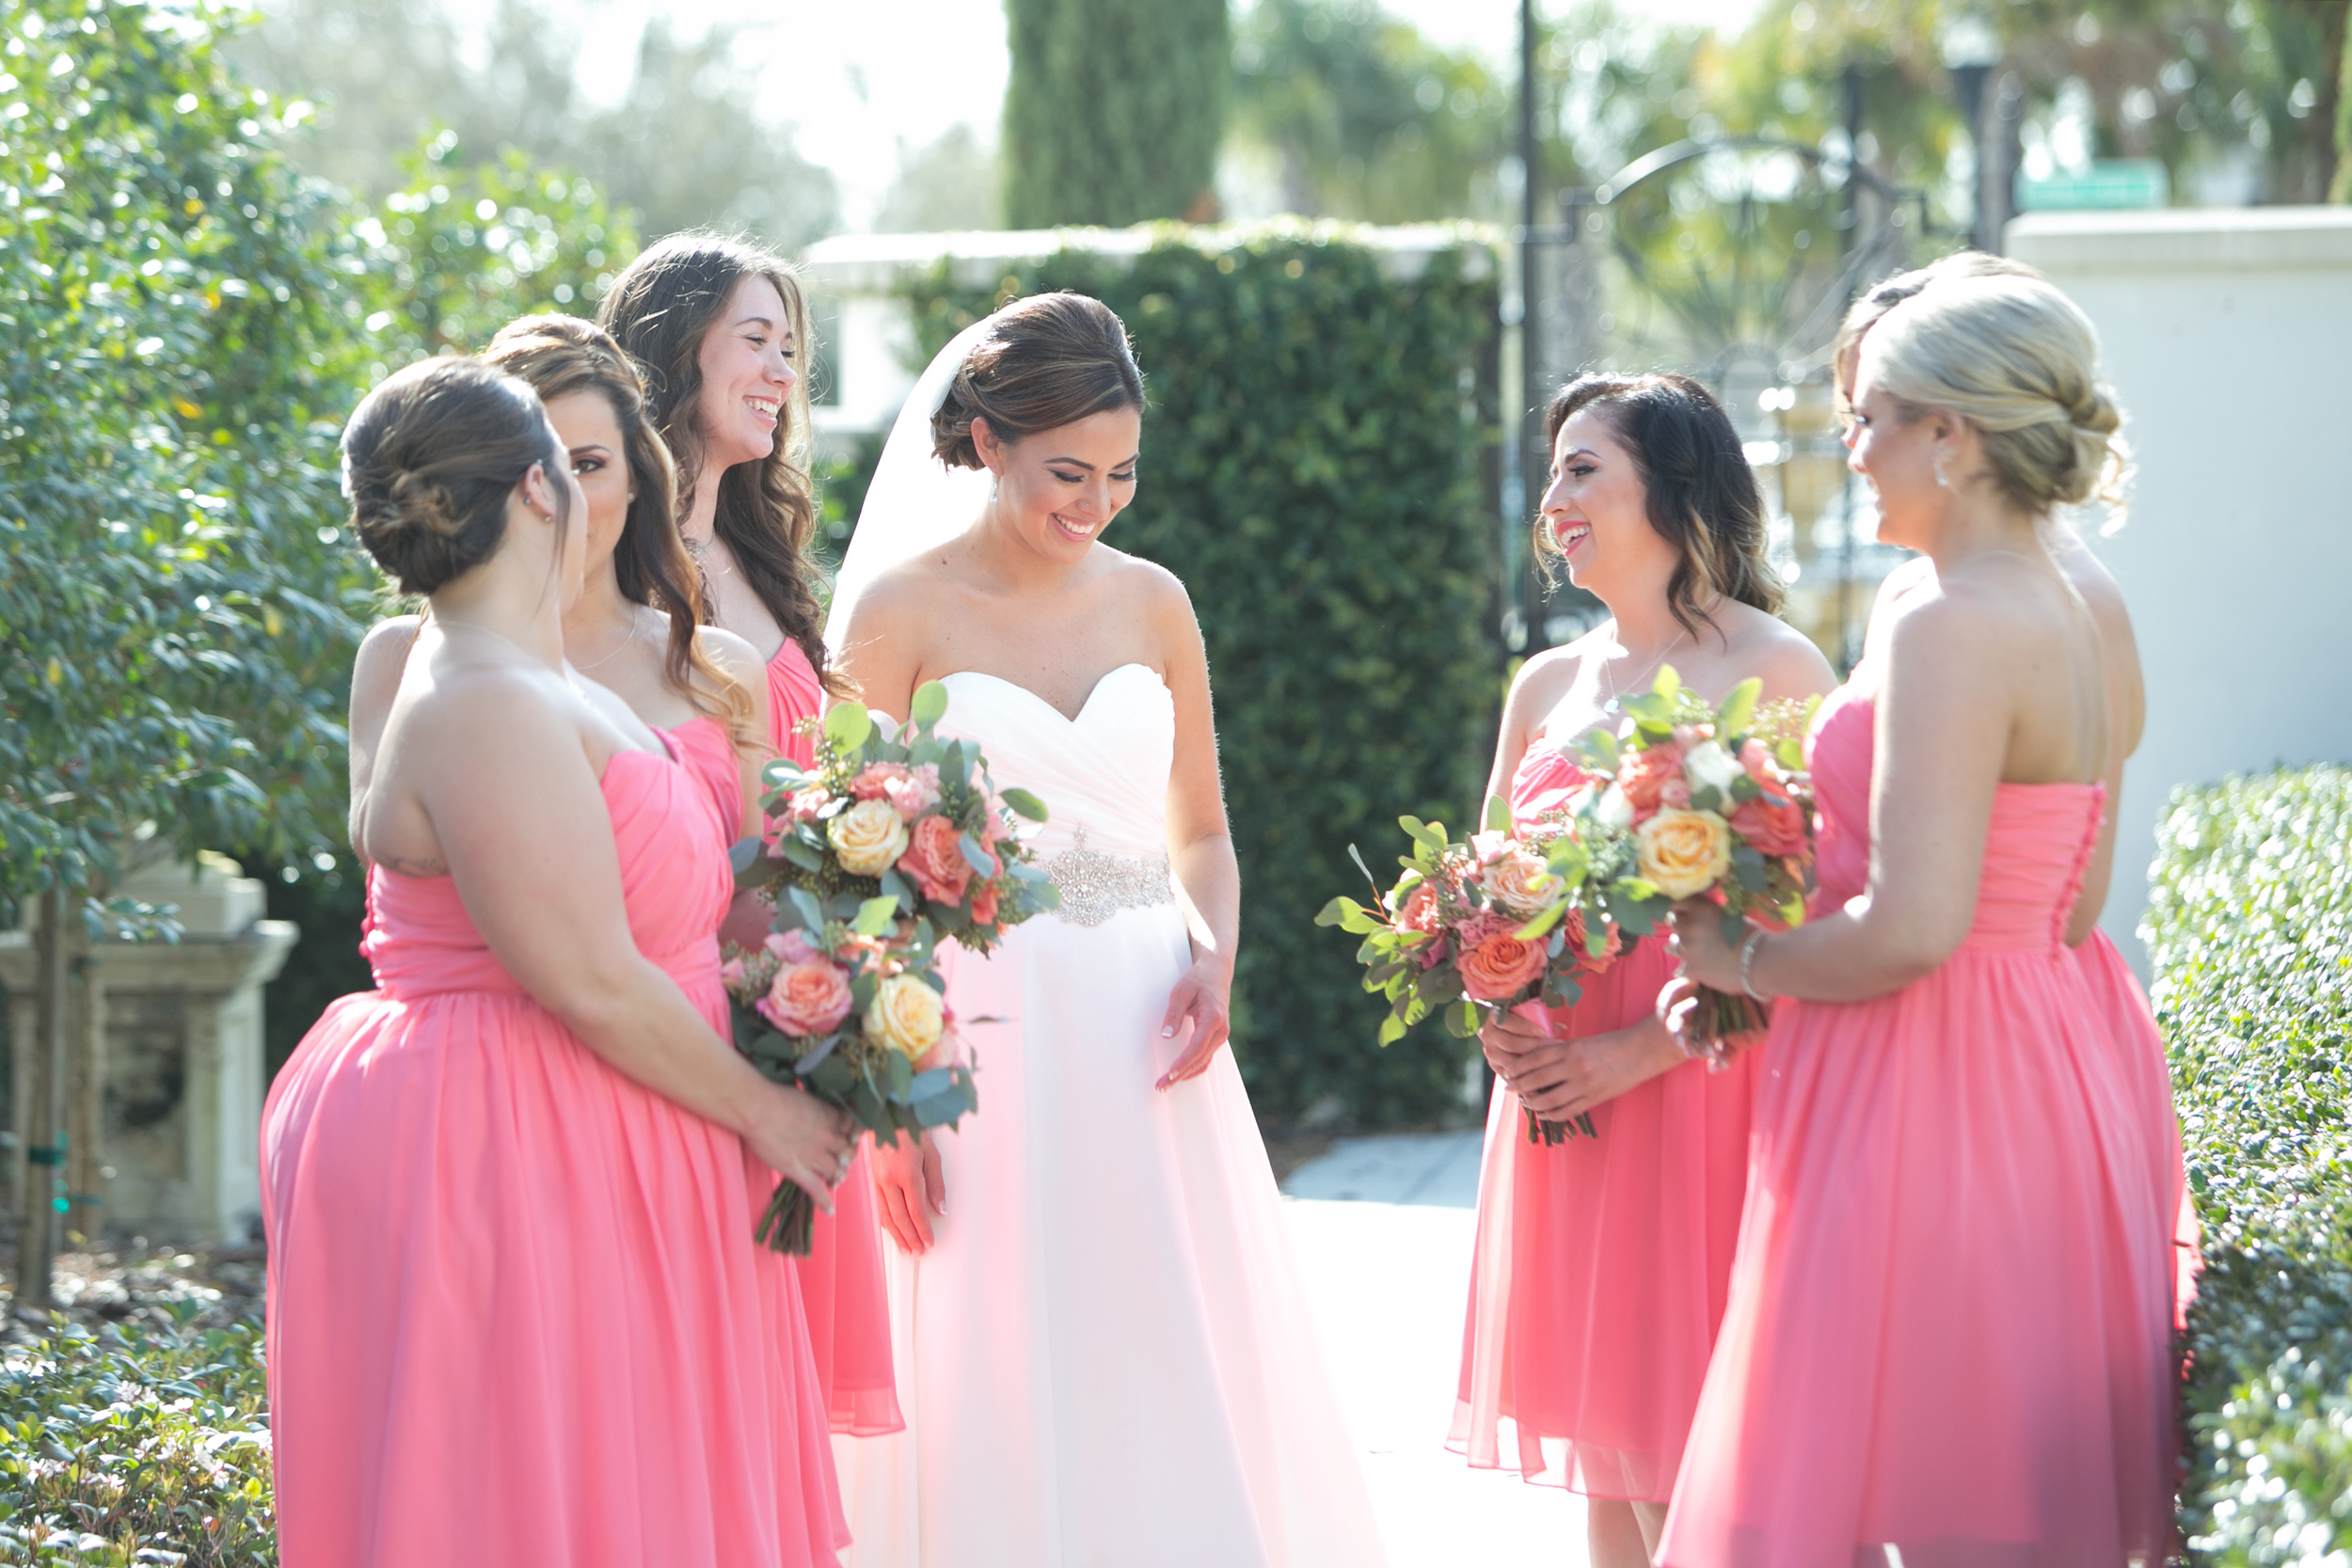 3_12_16 Vanessa and Blake Palemetto Club Wedding 0168.jpg